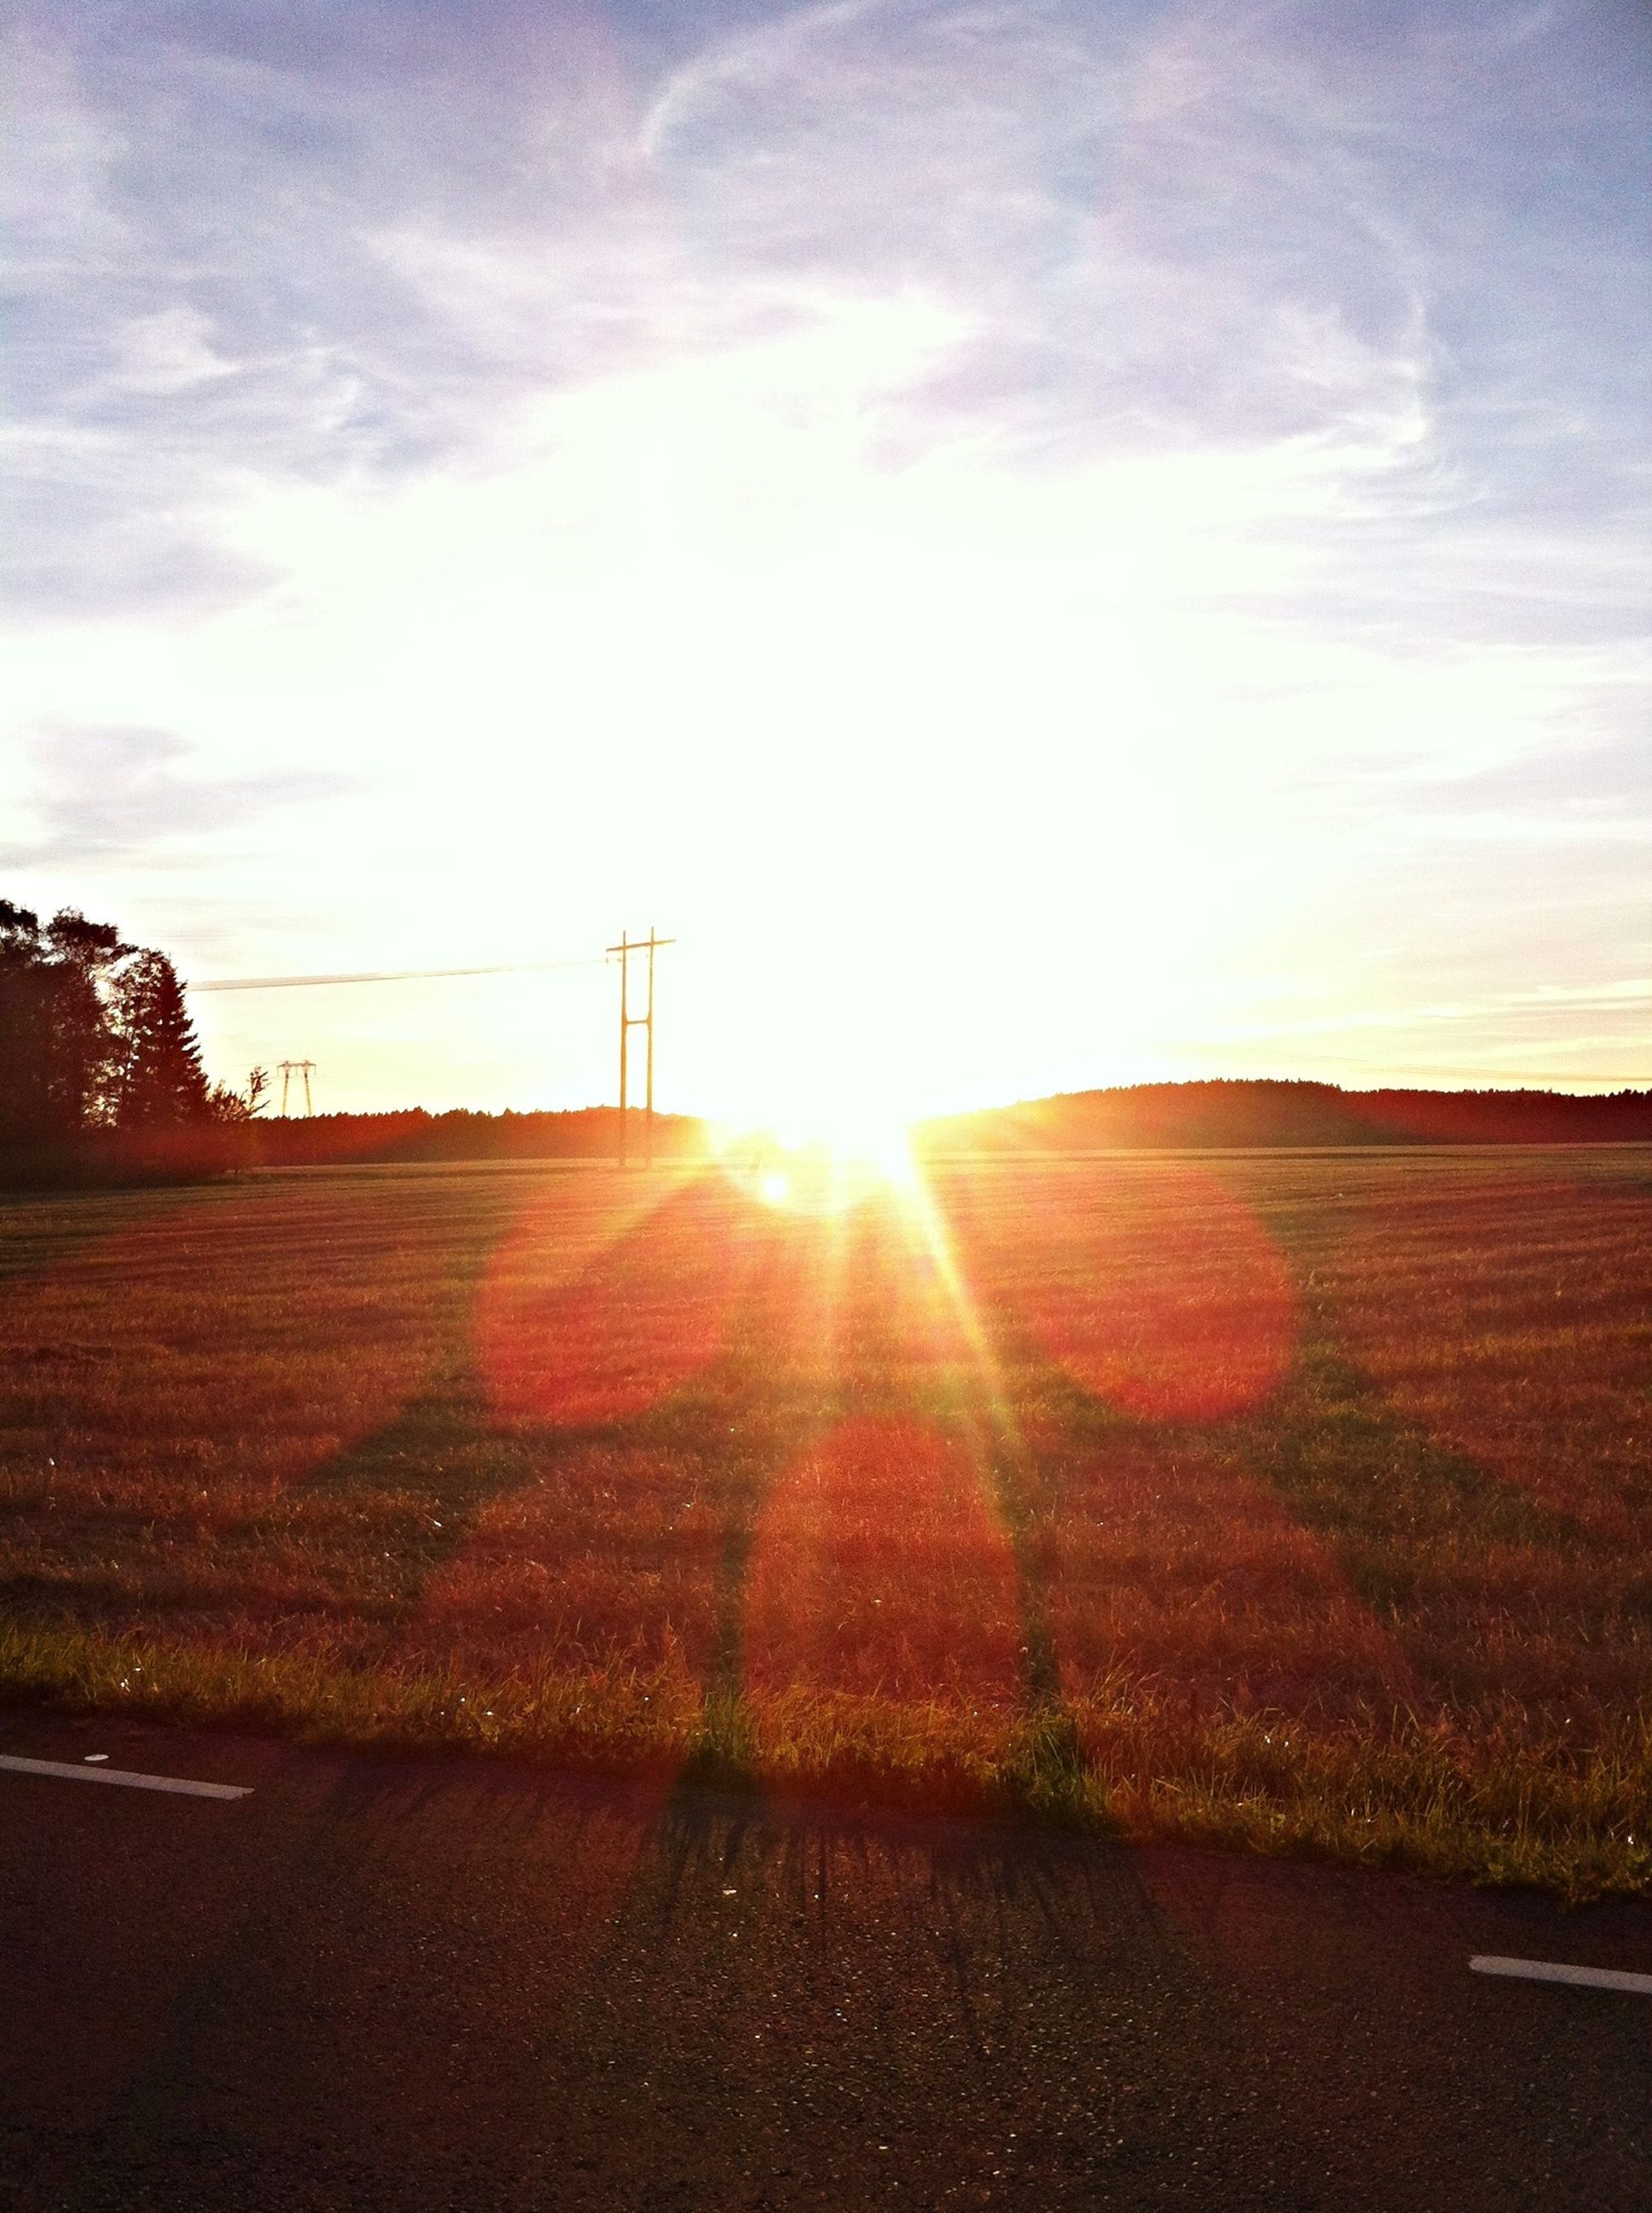 sun, sunset, sunbeam, sunlight, sky, lens flare, landscape, field, tranquil scene, tranquility, scenics, cloud - sky, nature, rural scene, road, beauty in nature, cloud, outdoors, silhouette, grass